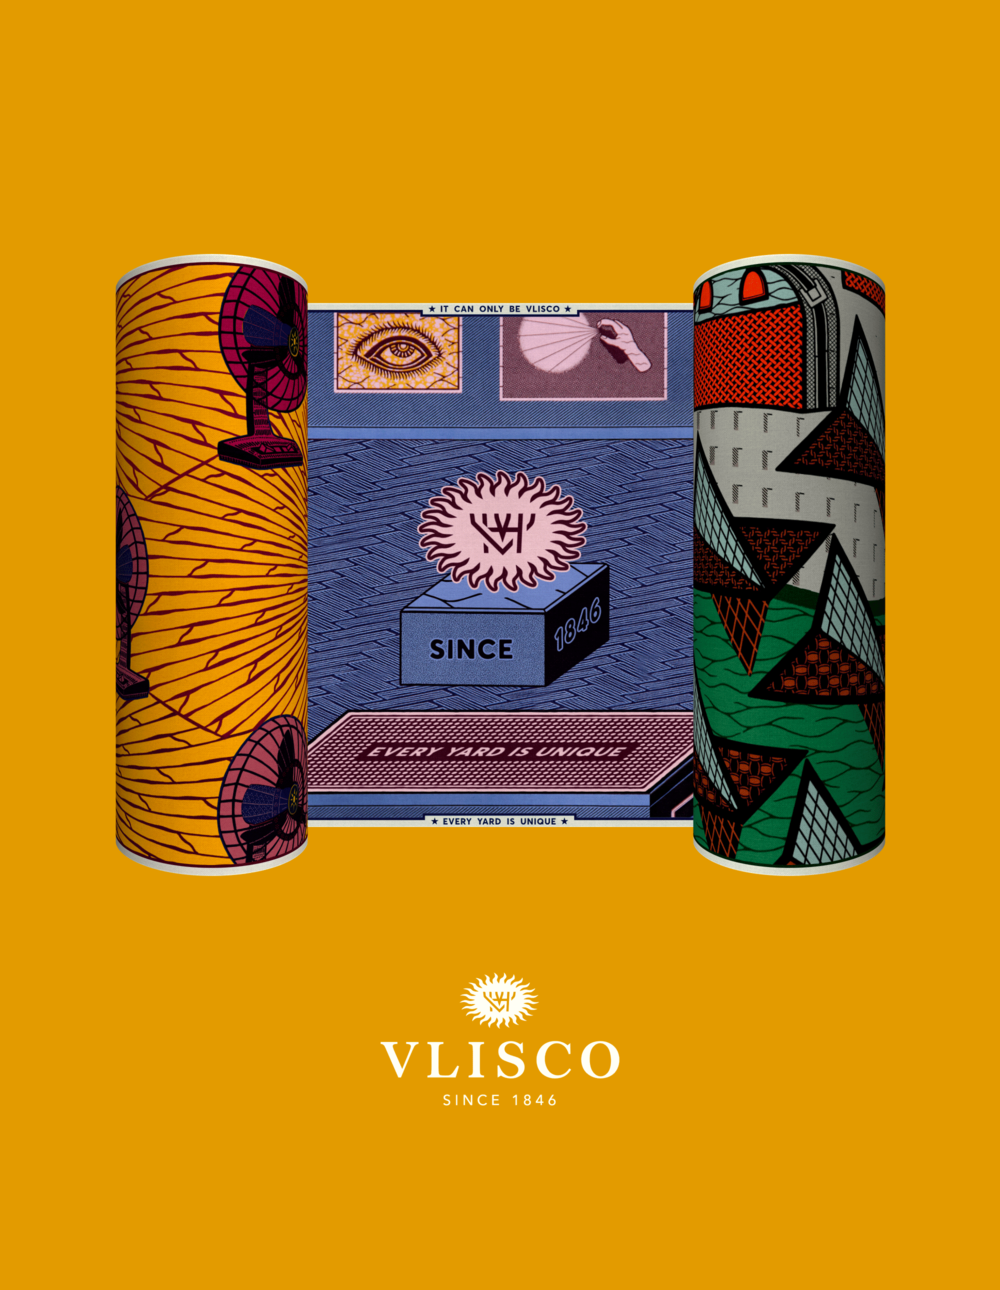 VLISCO_PRINT_00030.png